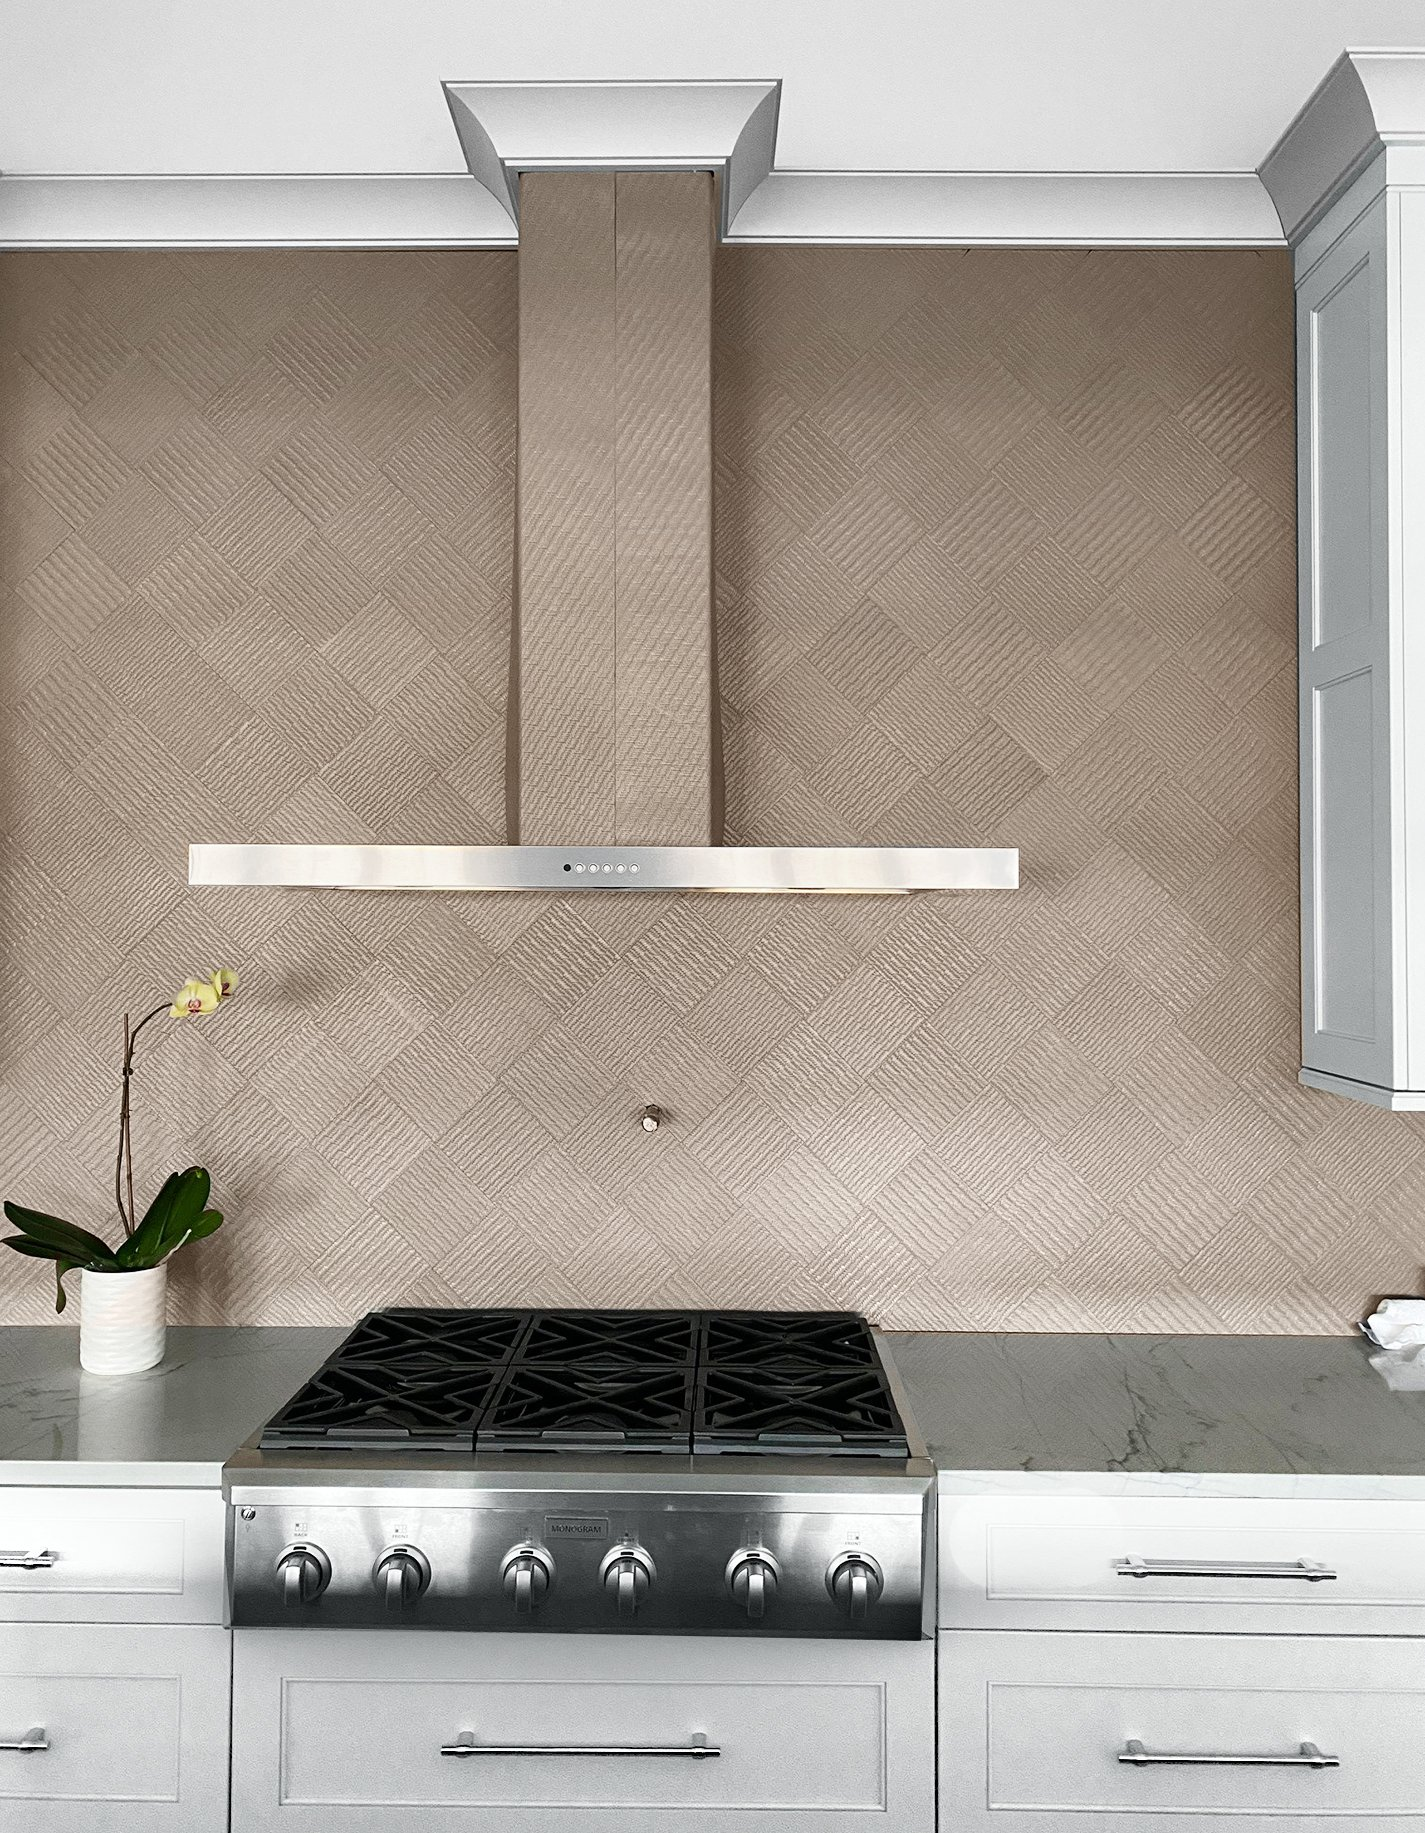 luxury home leather wall tiles kitchen backsplash ideas keleen leathers